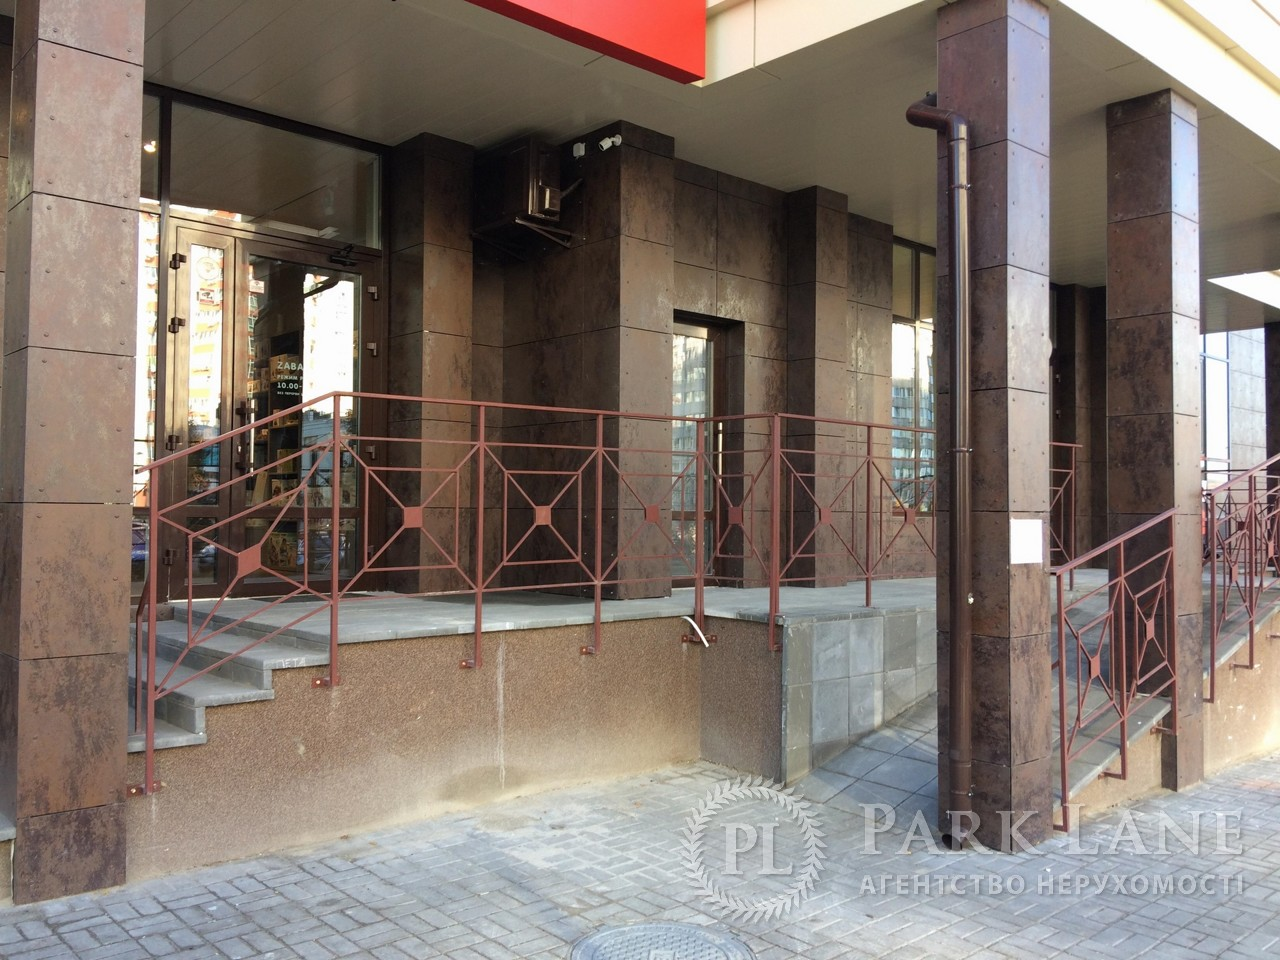 Квартира Тычины Павла просп., 18б, Киев, Z-147155 - Фото 3